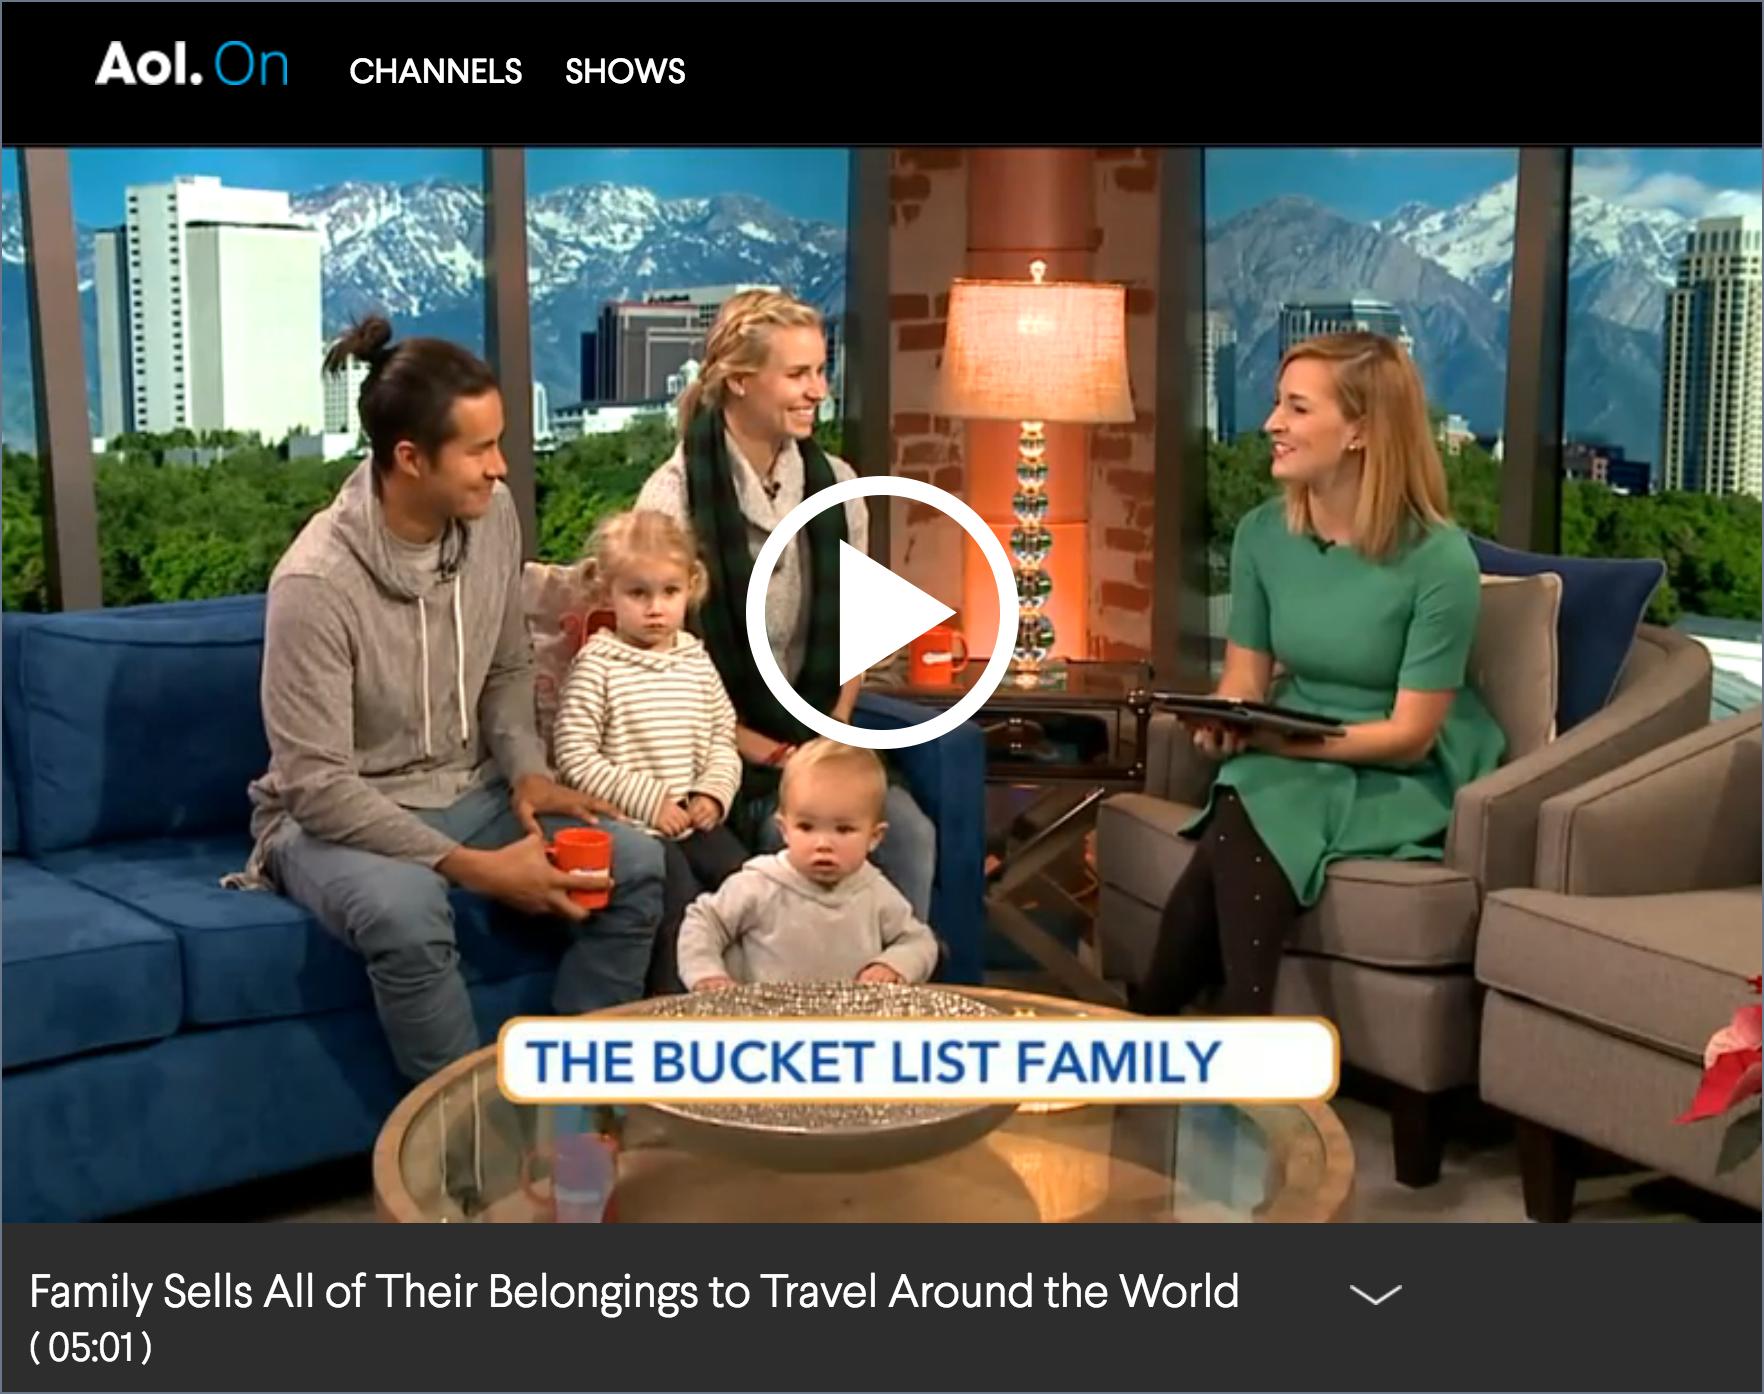 the-bucket-list-family-news-aol-fox-2.png